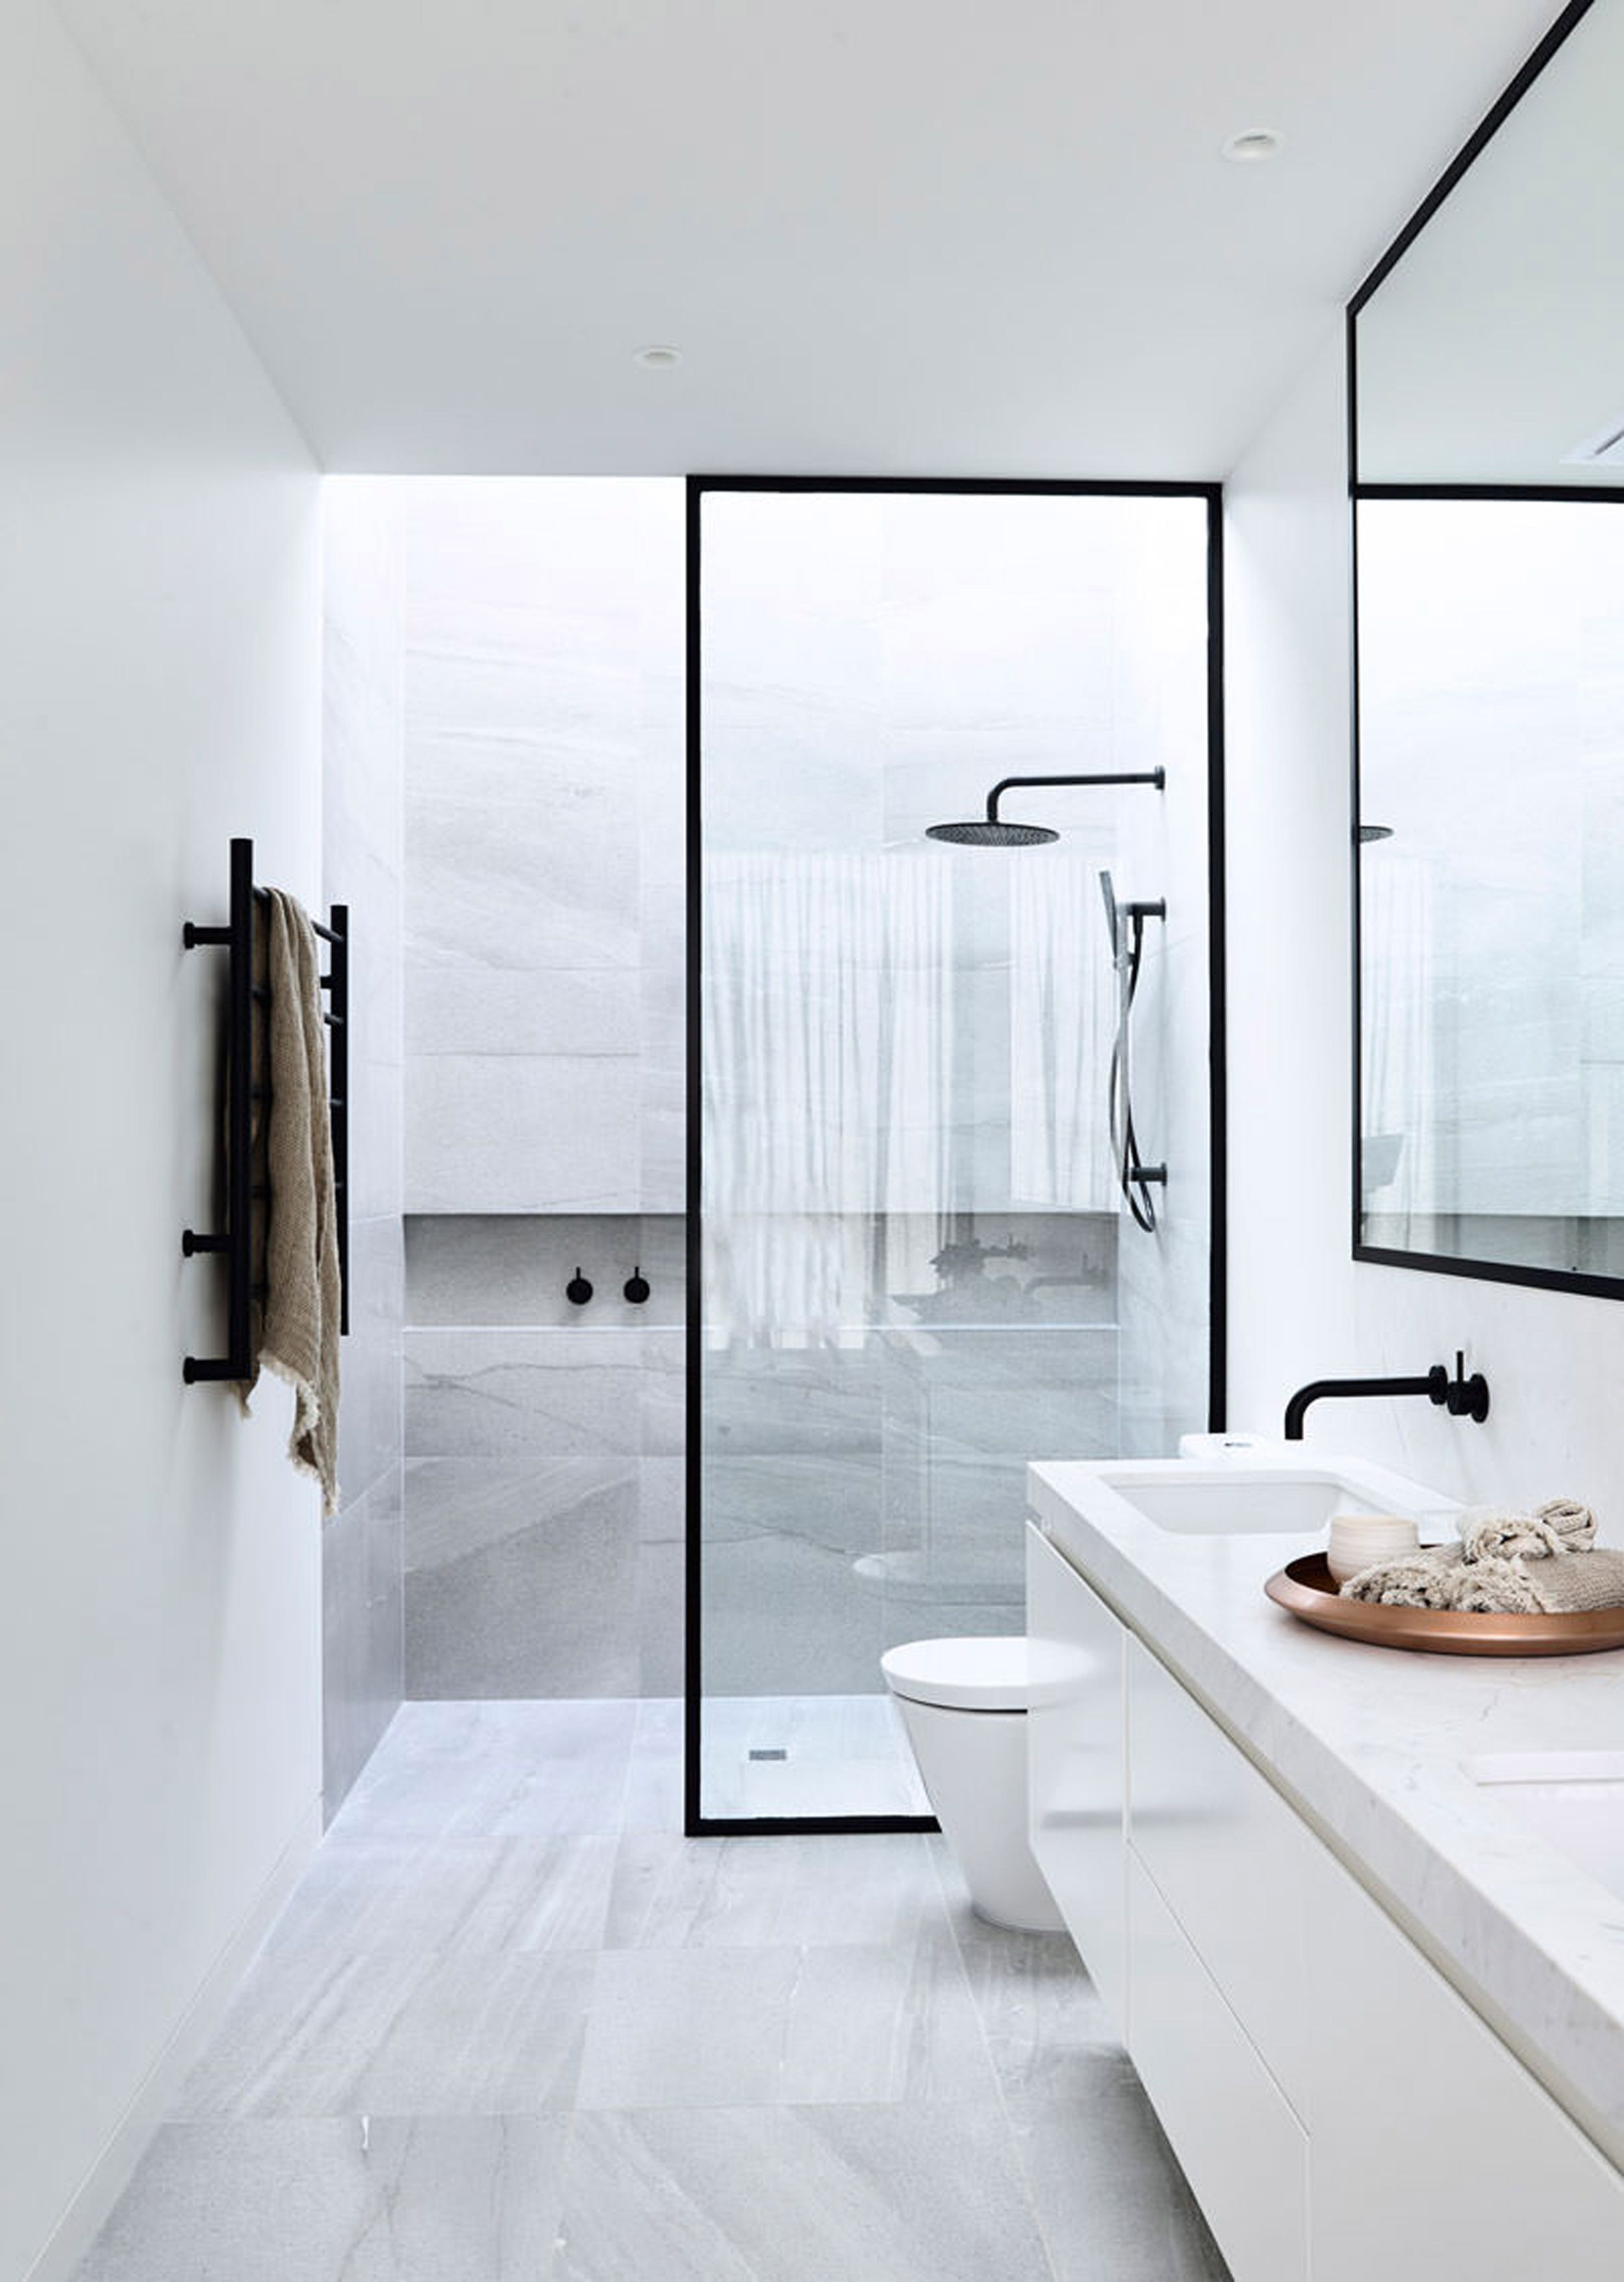 2018 Design Trends for the Bathroom  Bathroom  Pinterest